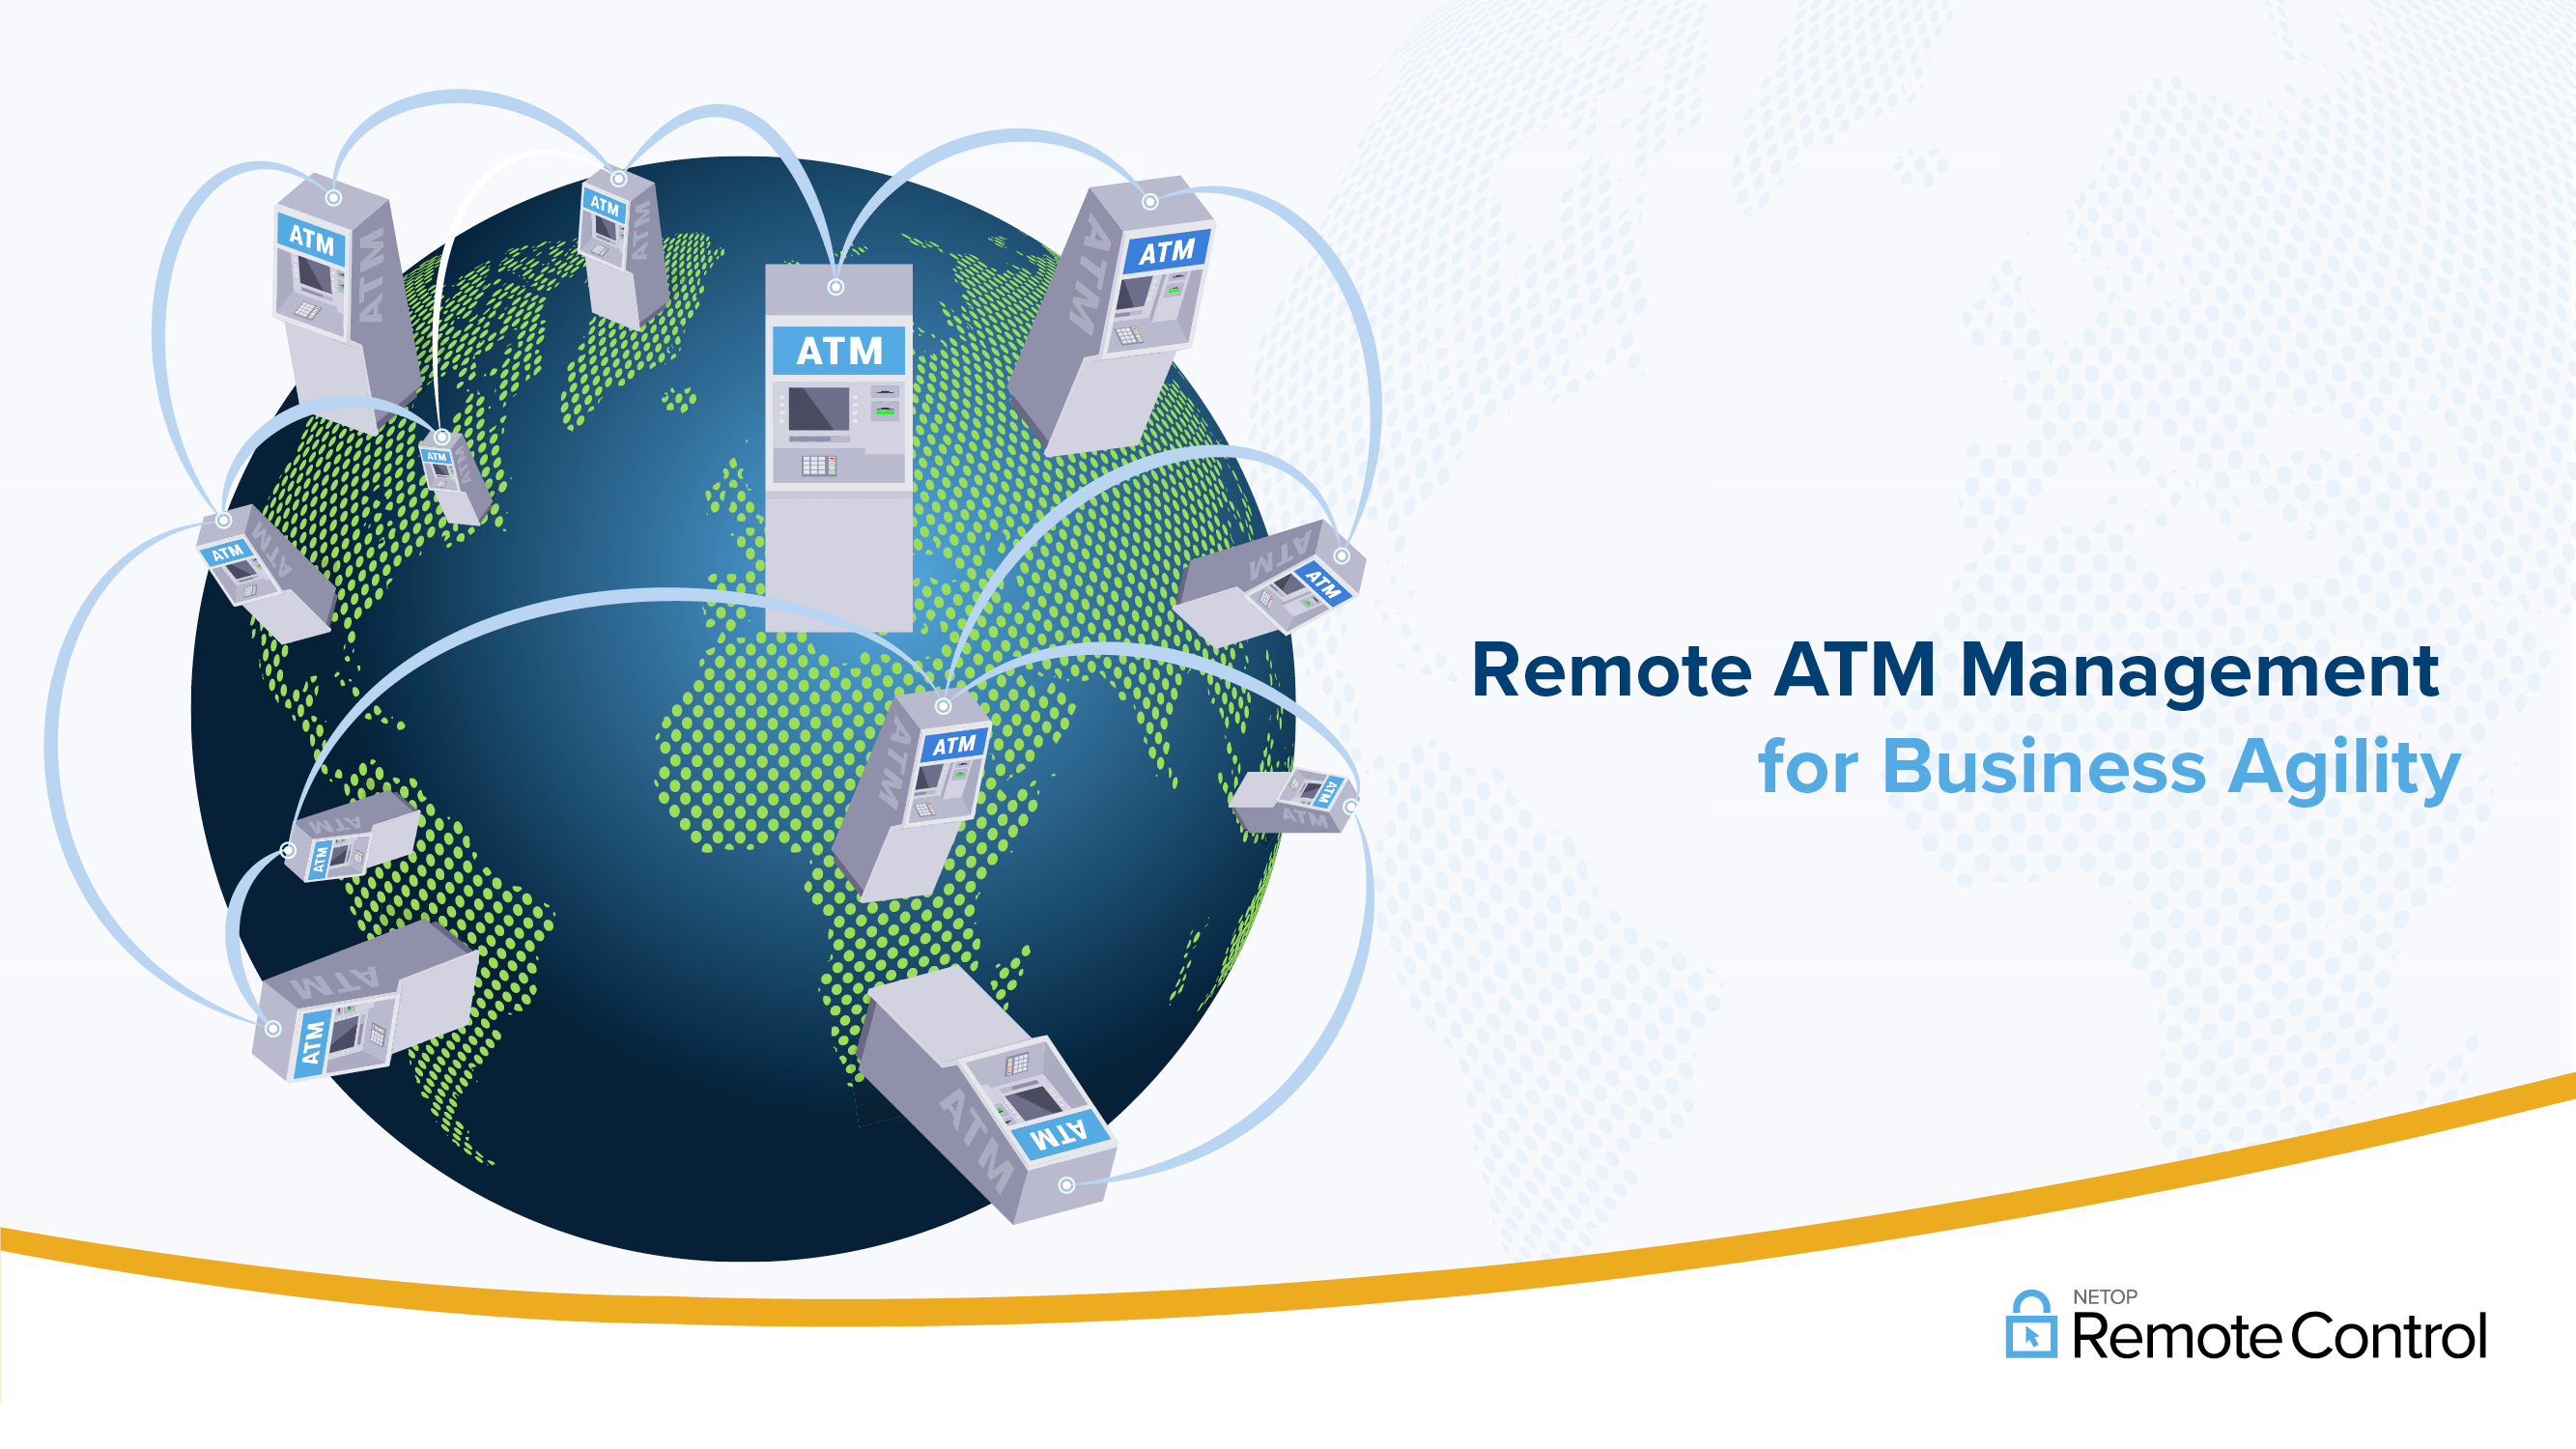 NRC_ATM_Device_Management_Best_Practices_2021_Brighttalk_Thumbnail_Design_640x360px_v3c1